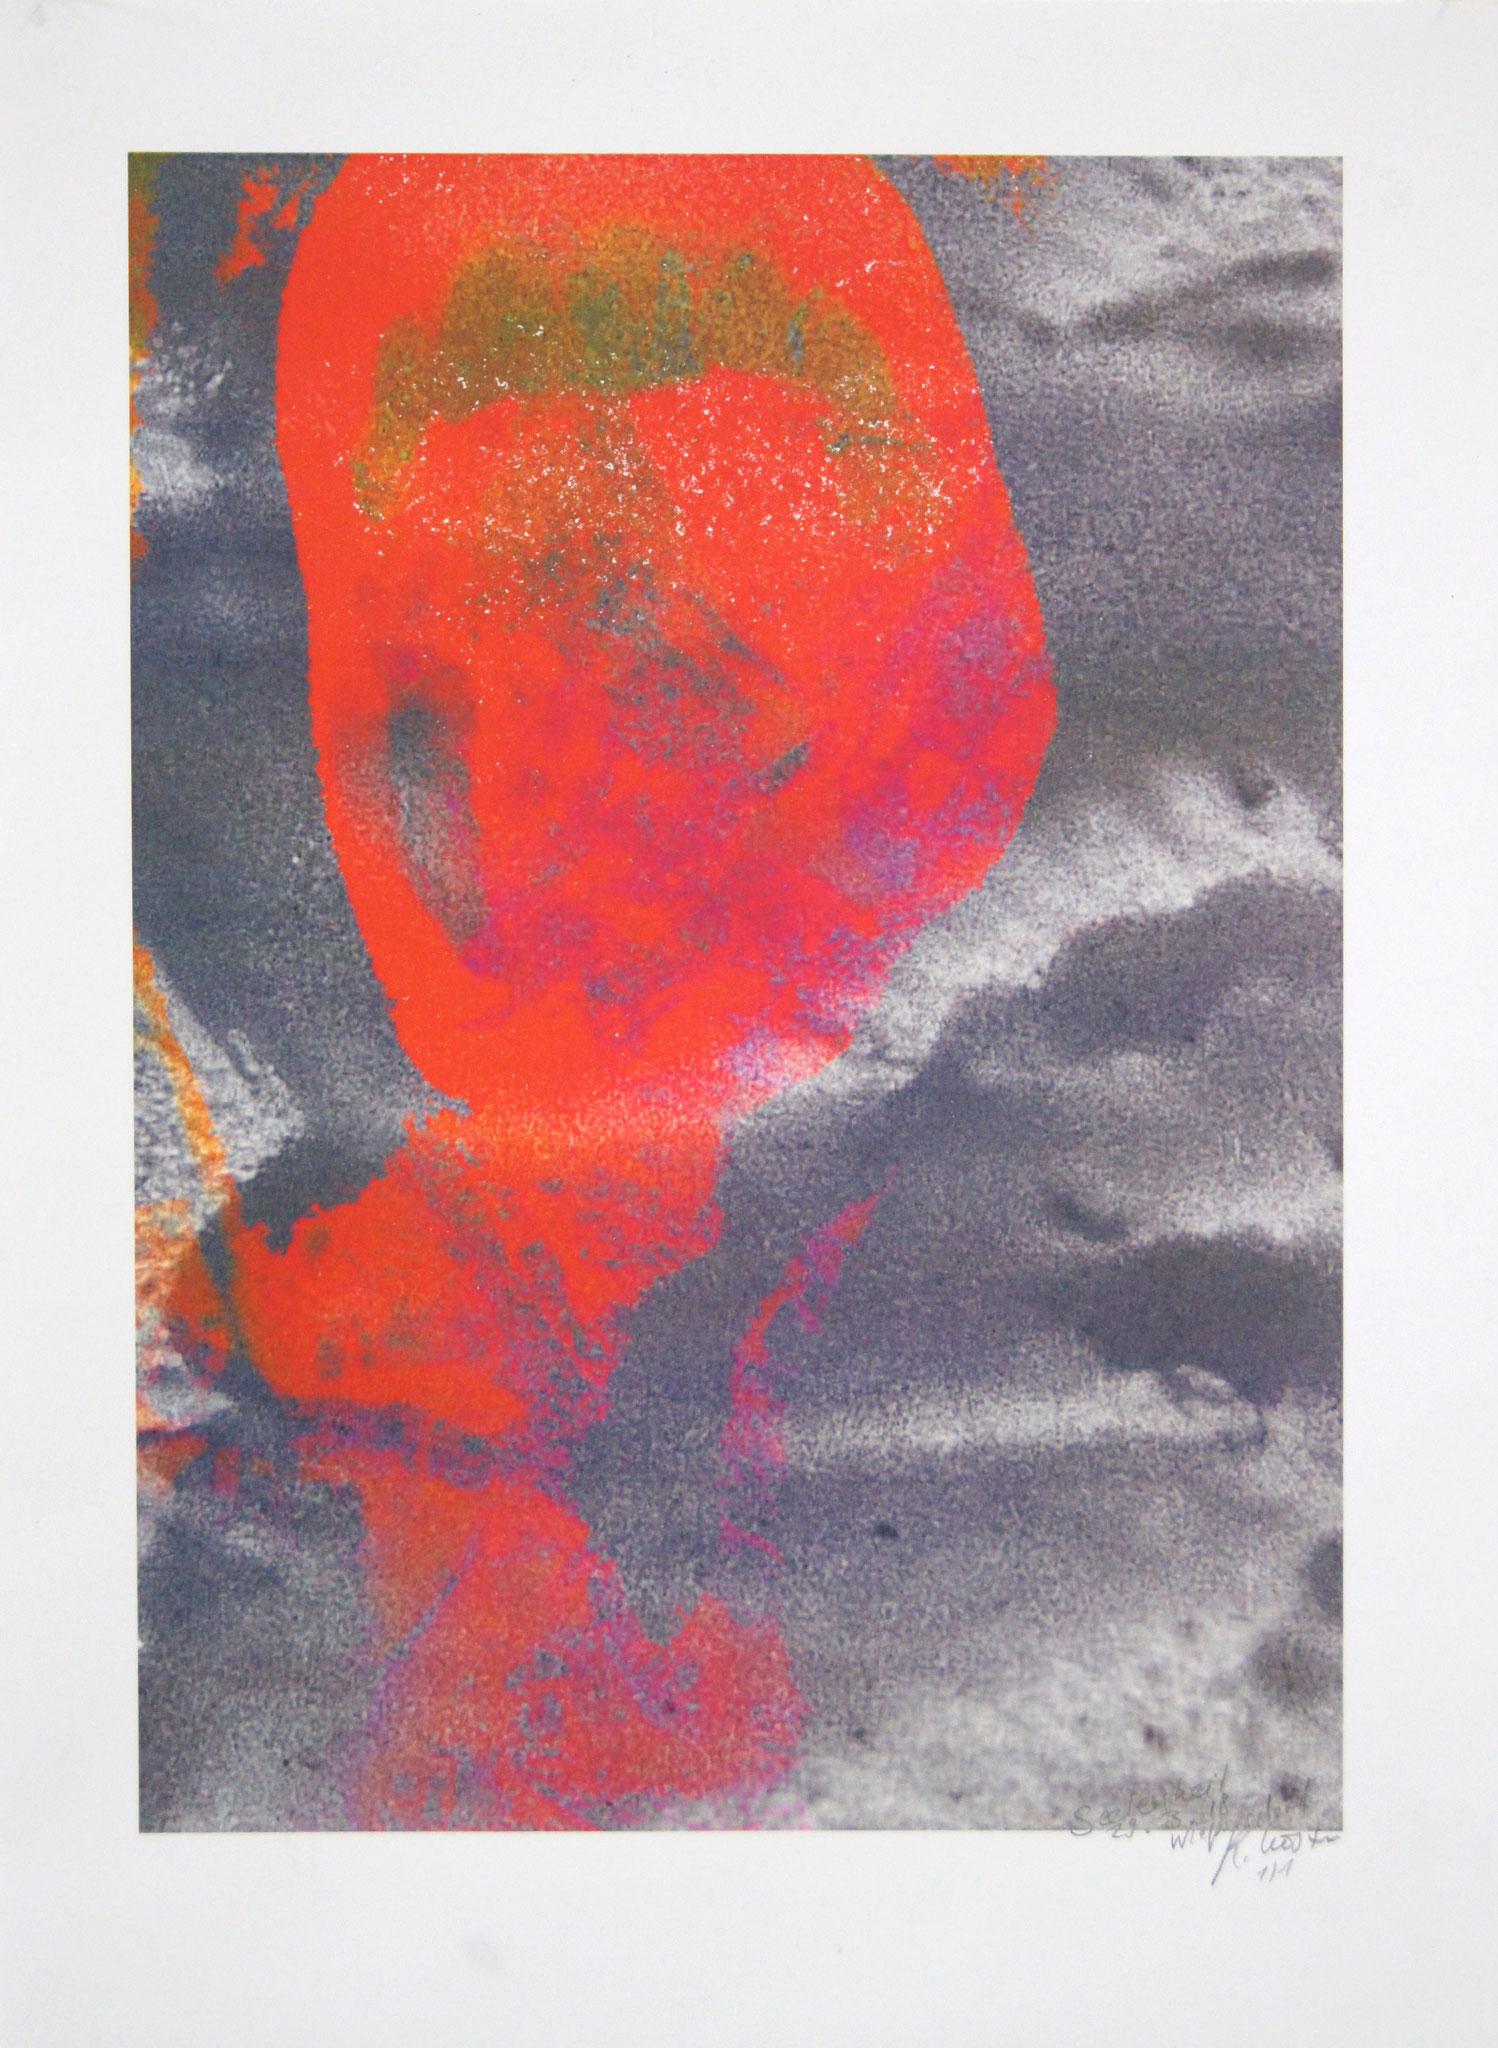 Seelenheil, Digitale Collage